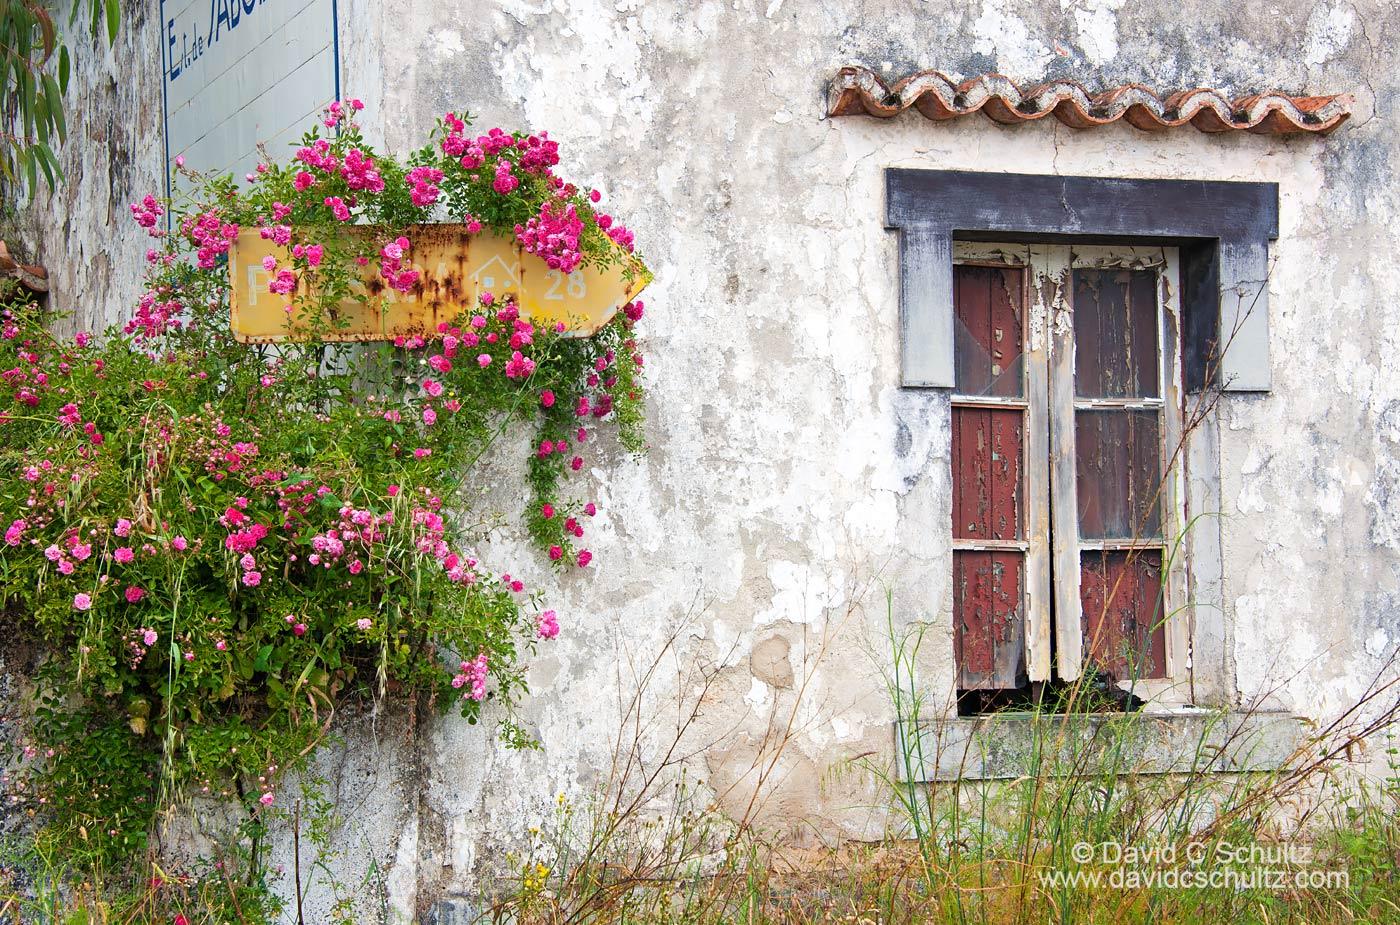 Portugal - Image #203-668